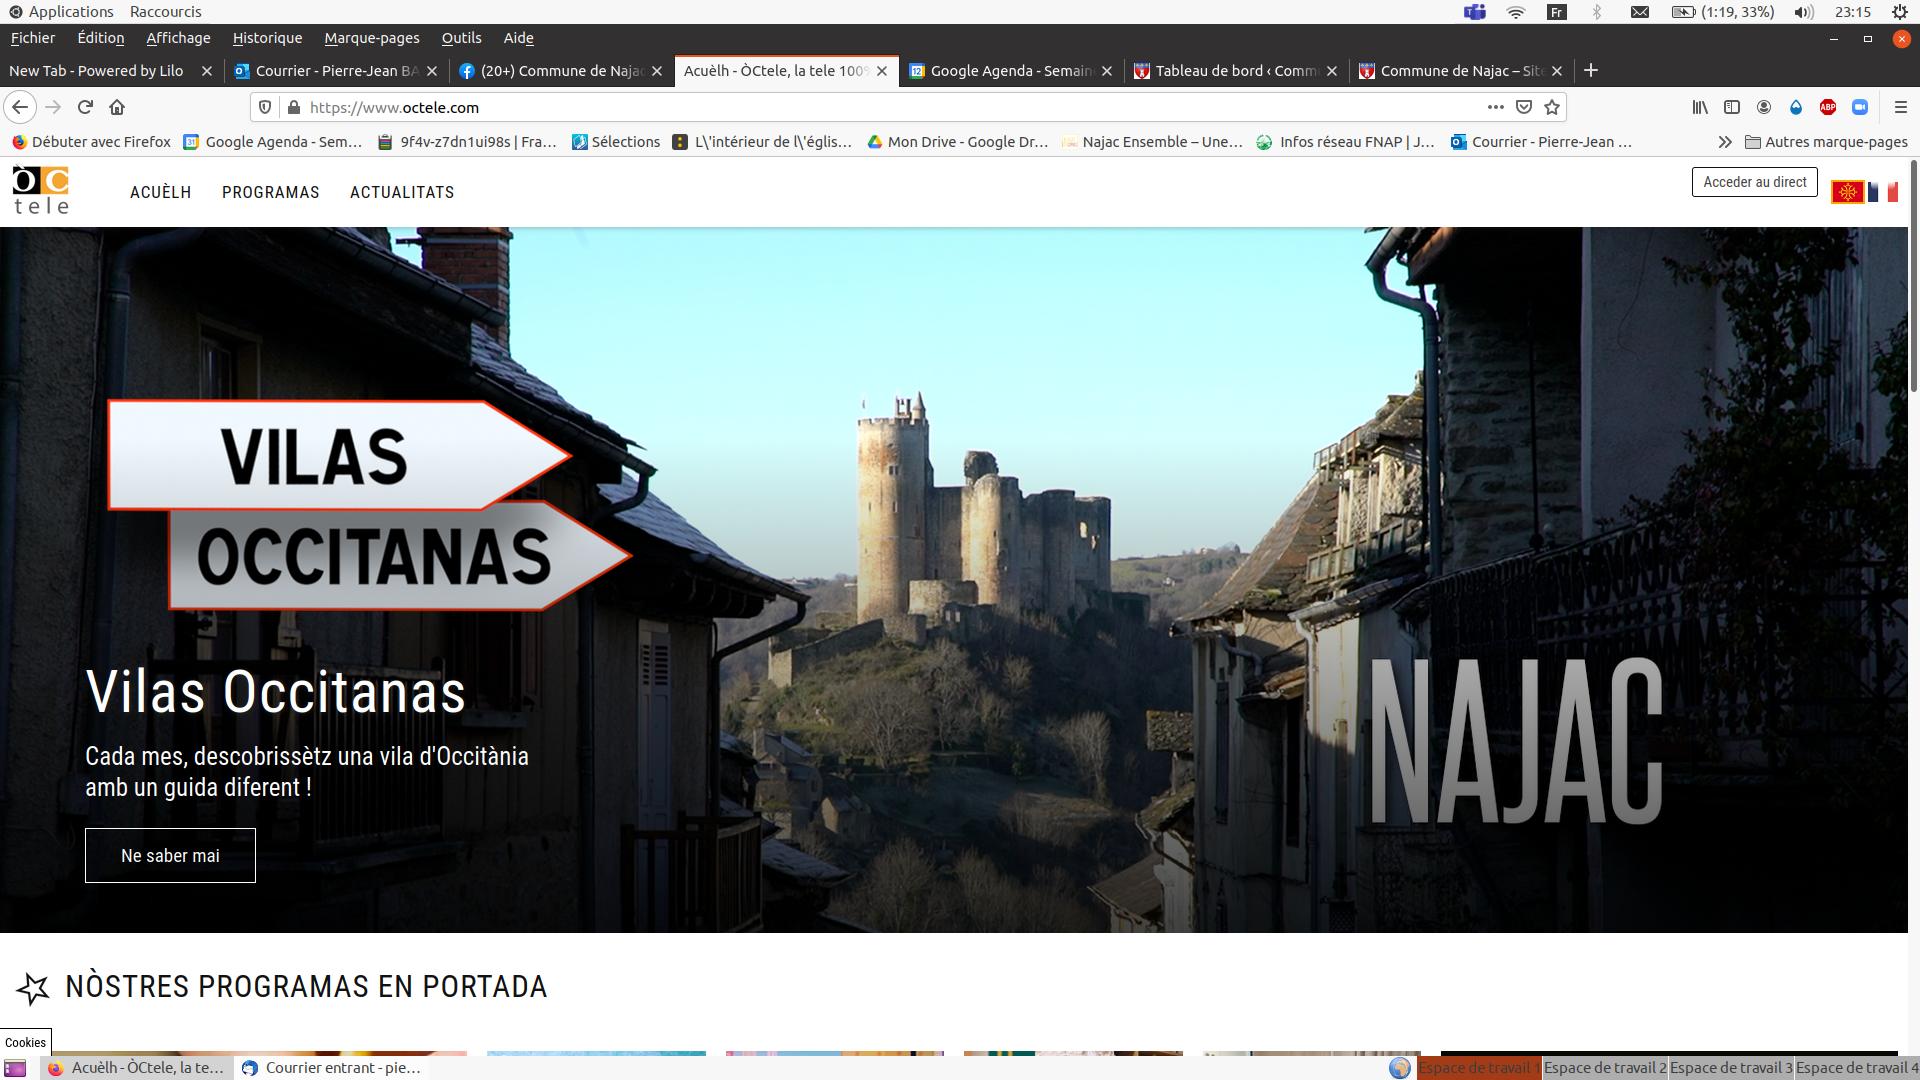 «Vilas Occitanas» d'Oc Télé,   consacré à Najac